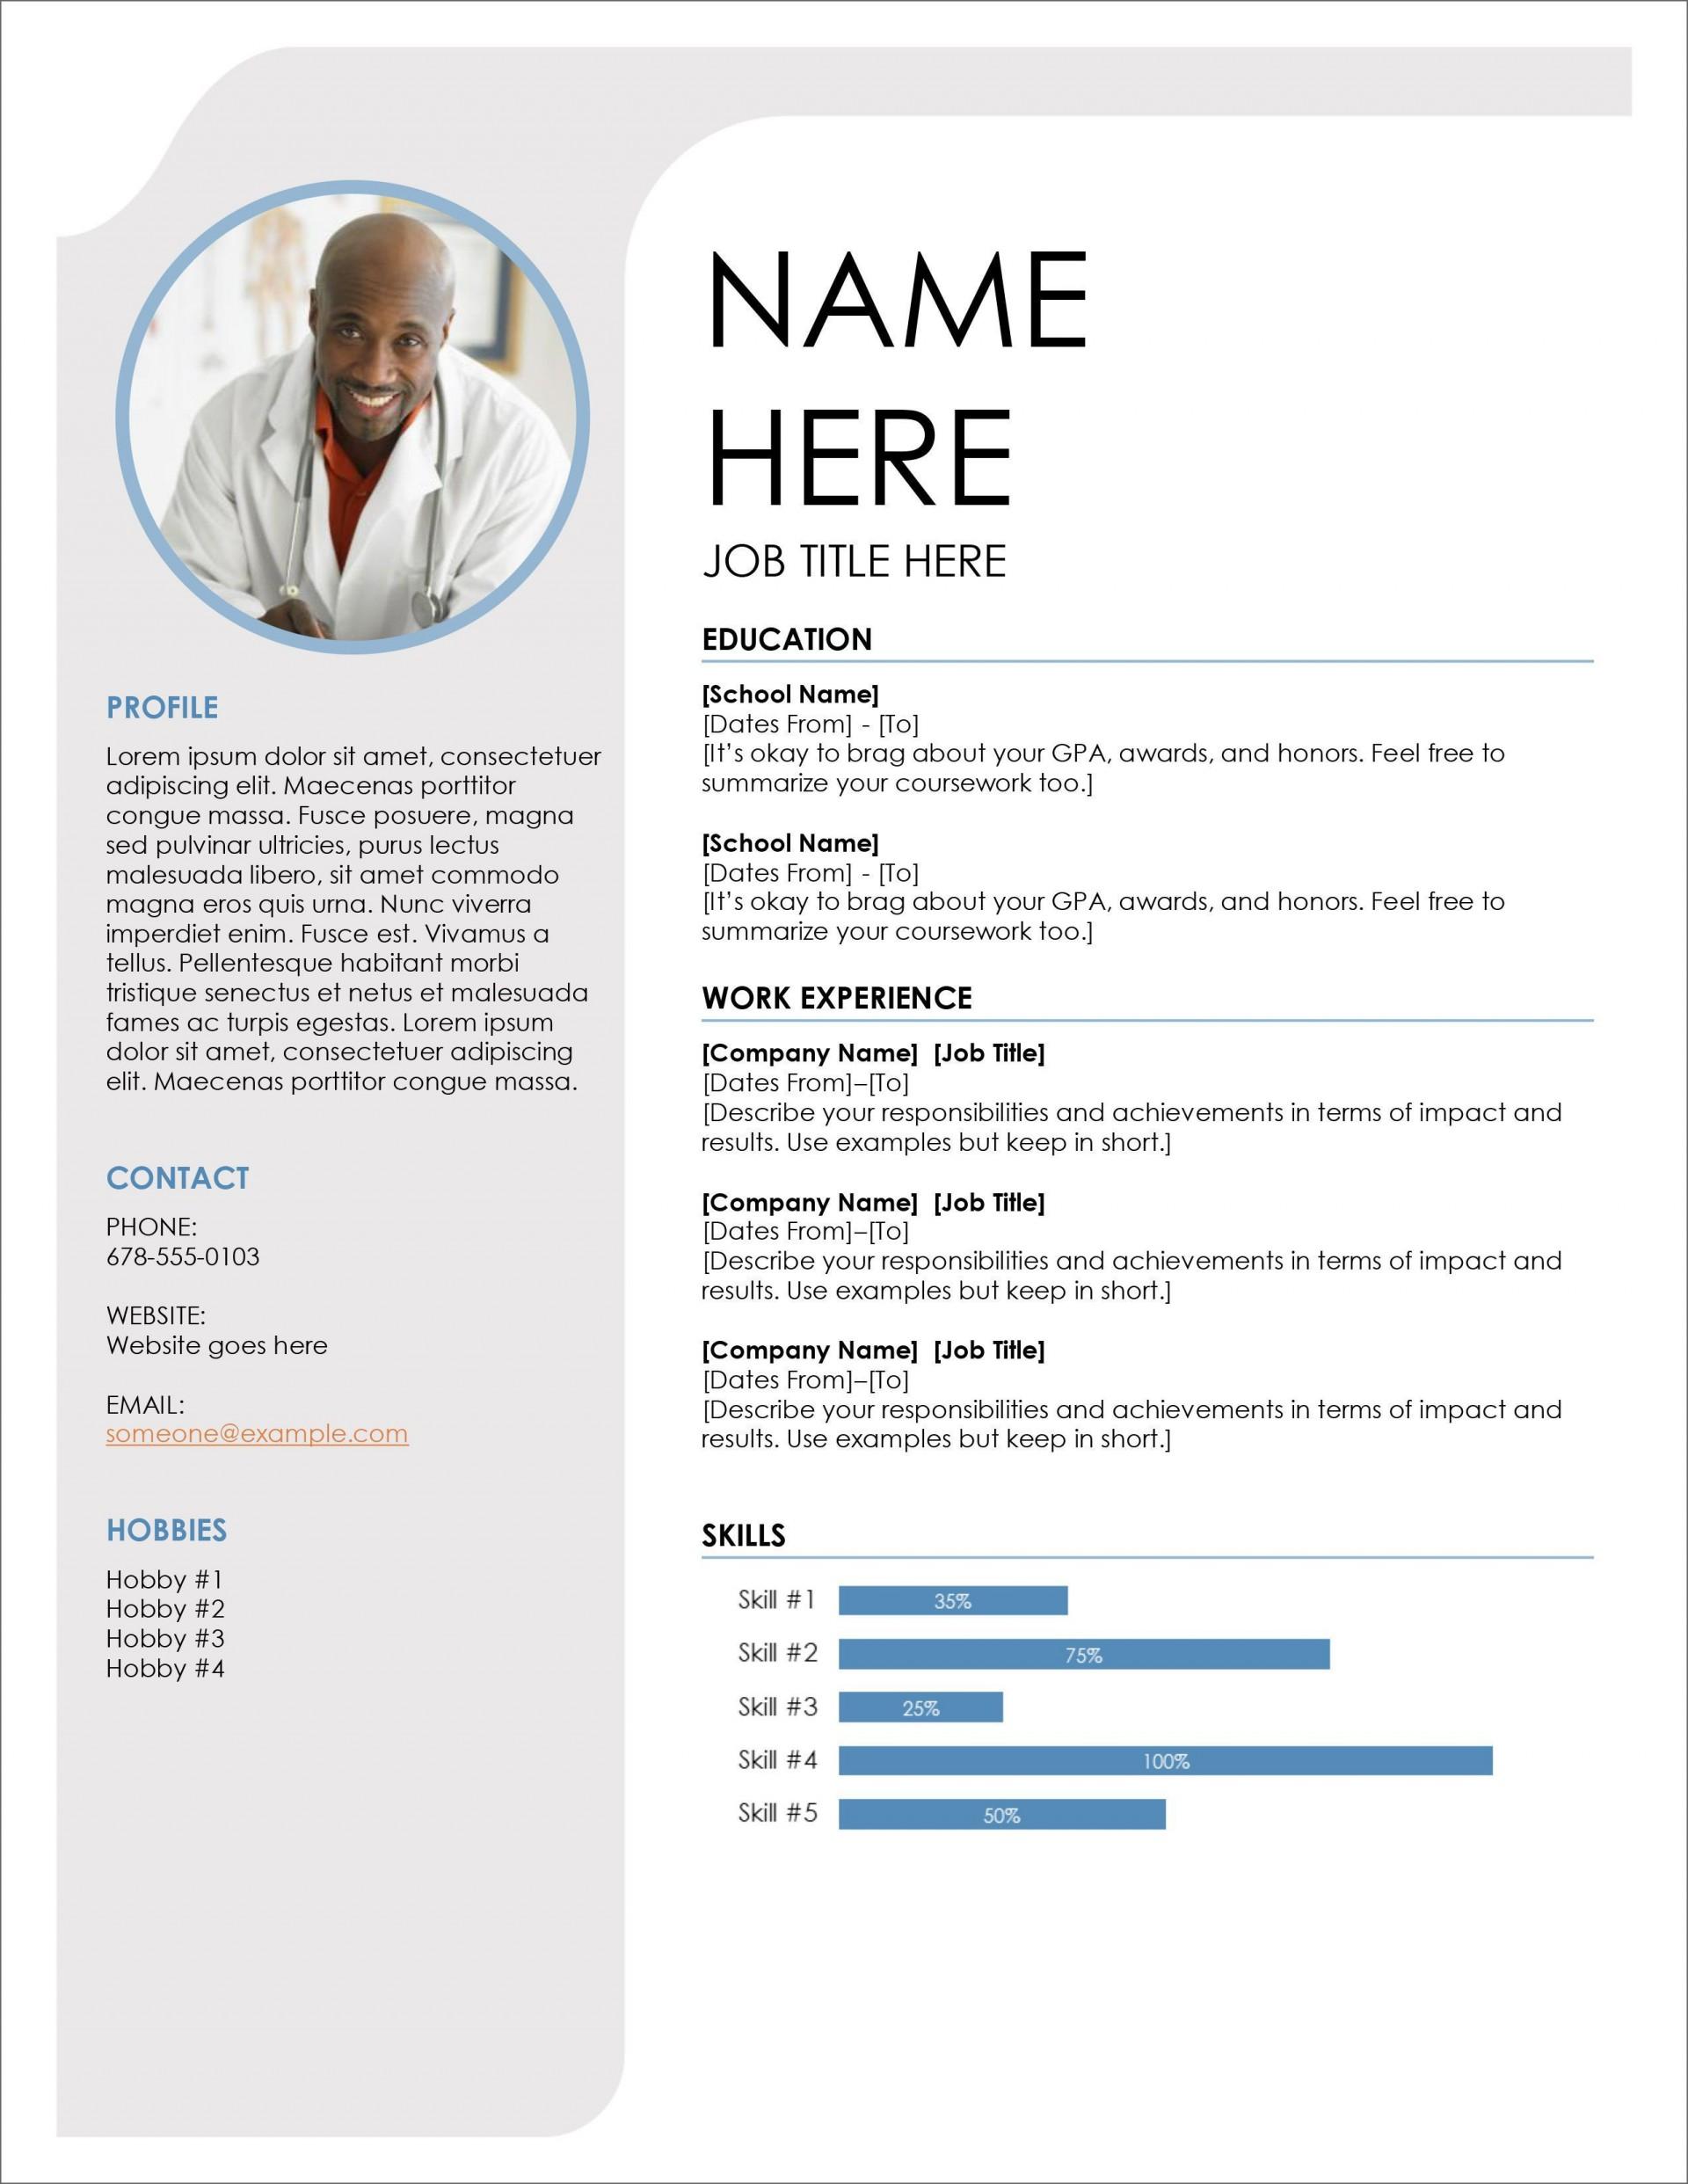 006 Awful Download Resume Sample Free High Resolution  Teacher Cv Graphic Designer Word Format Nurse Template1920